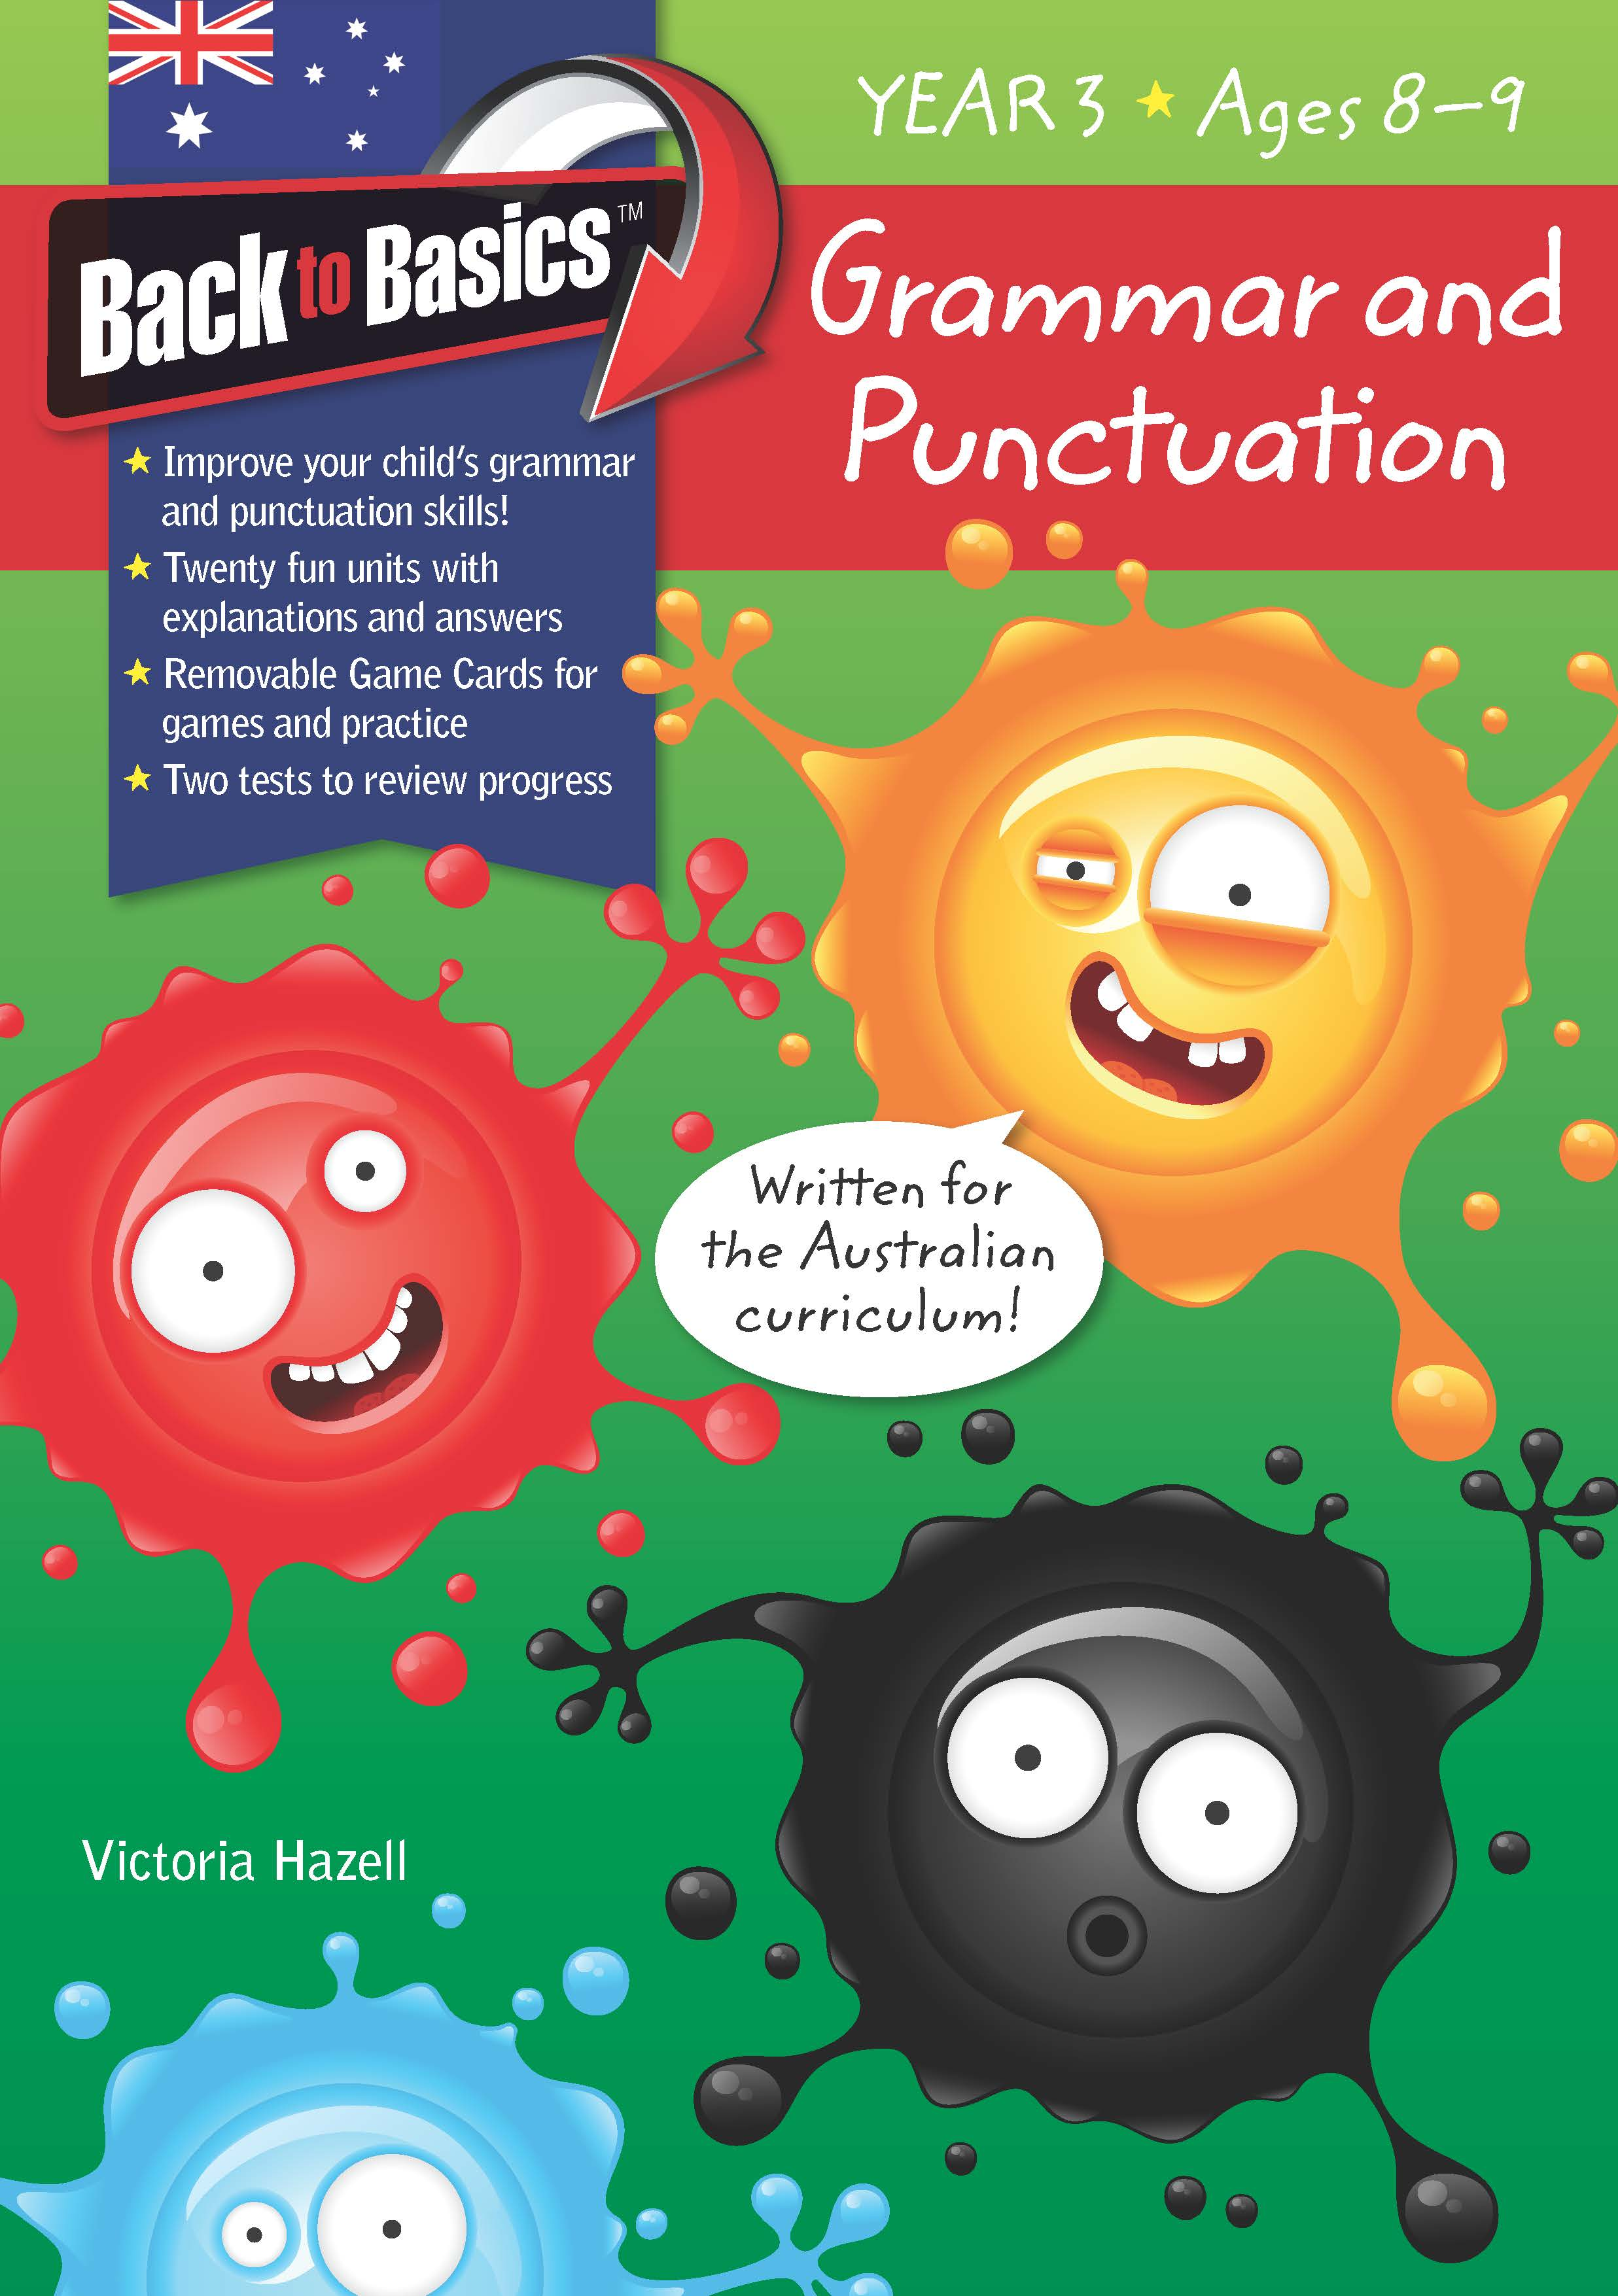 Back to Basics - Grammar & Punctuation Year 3